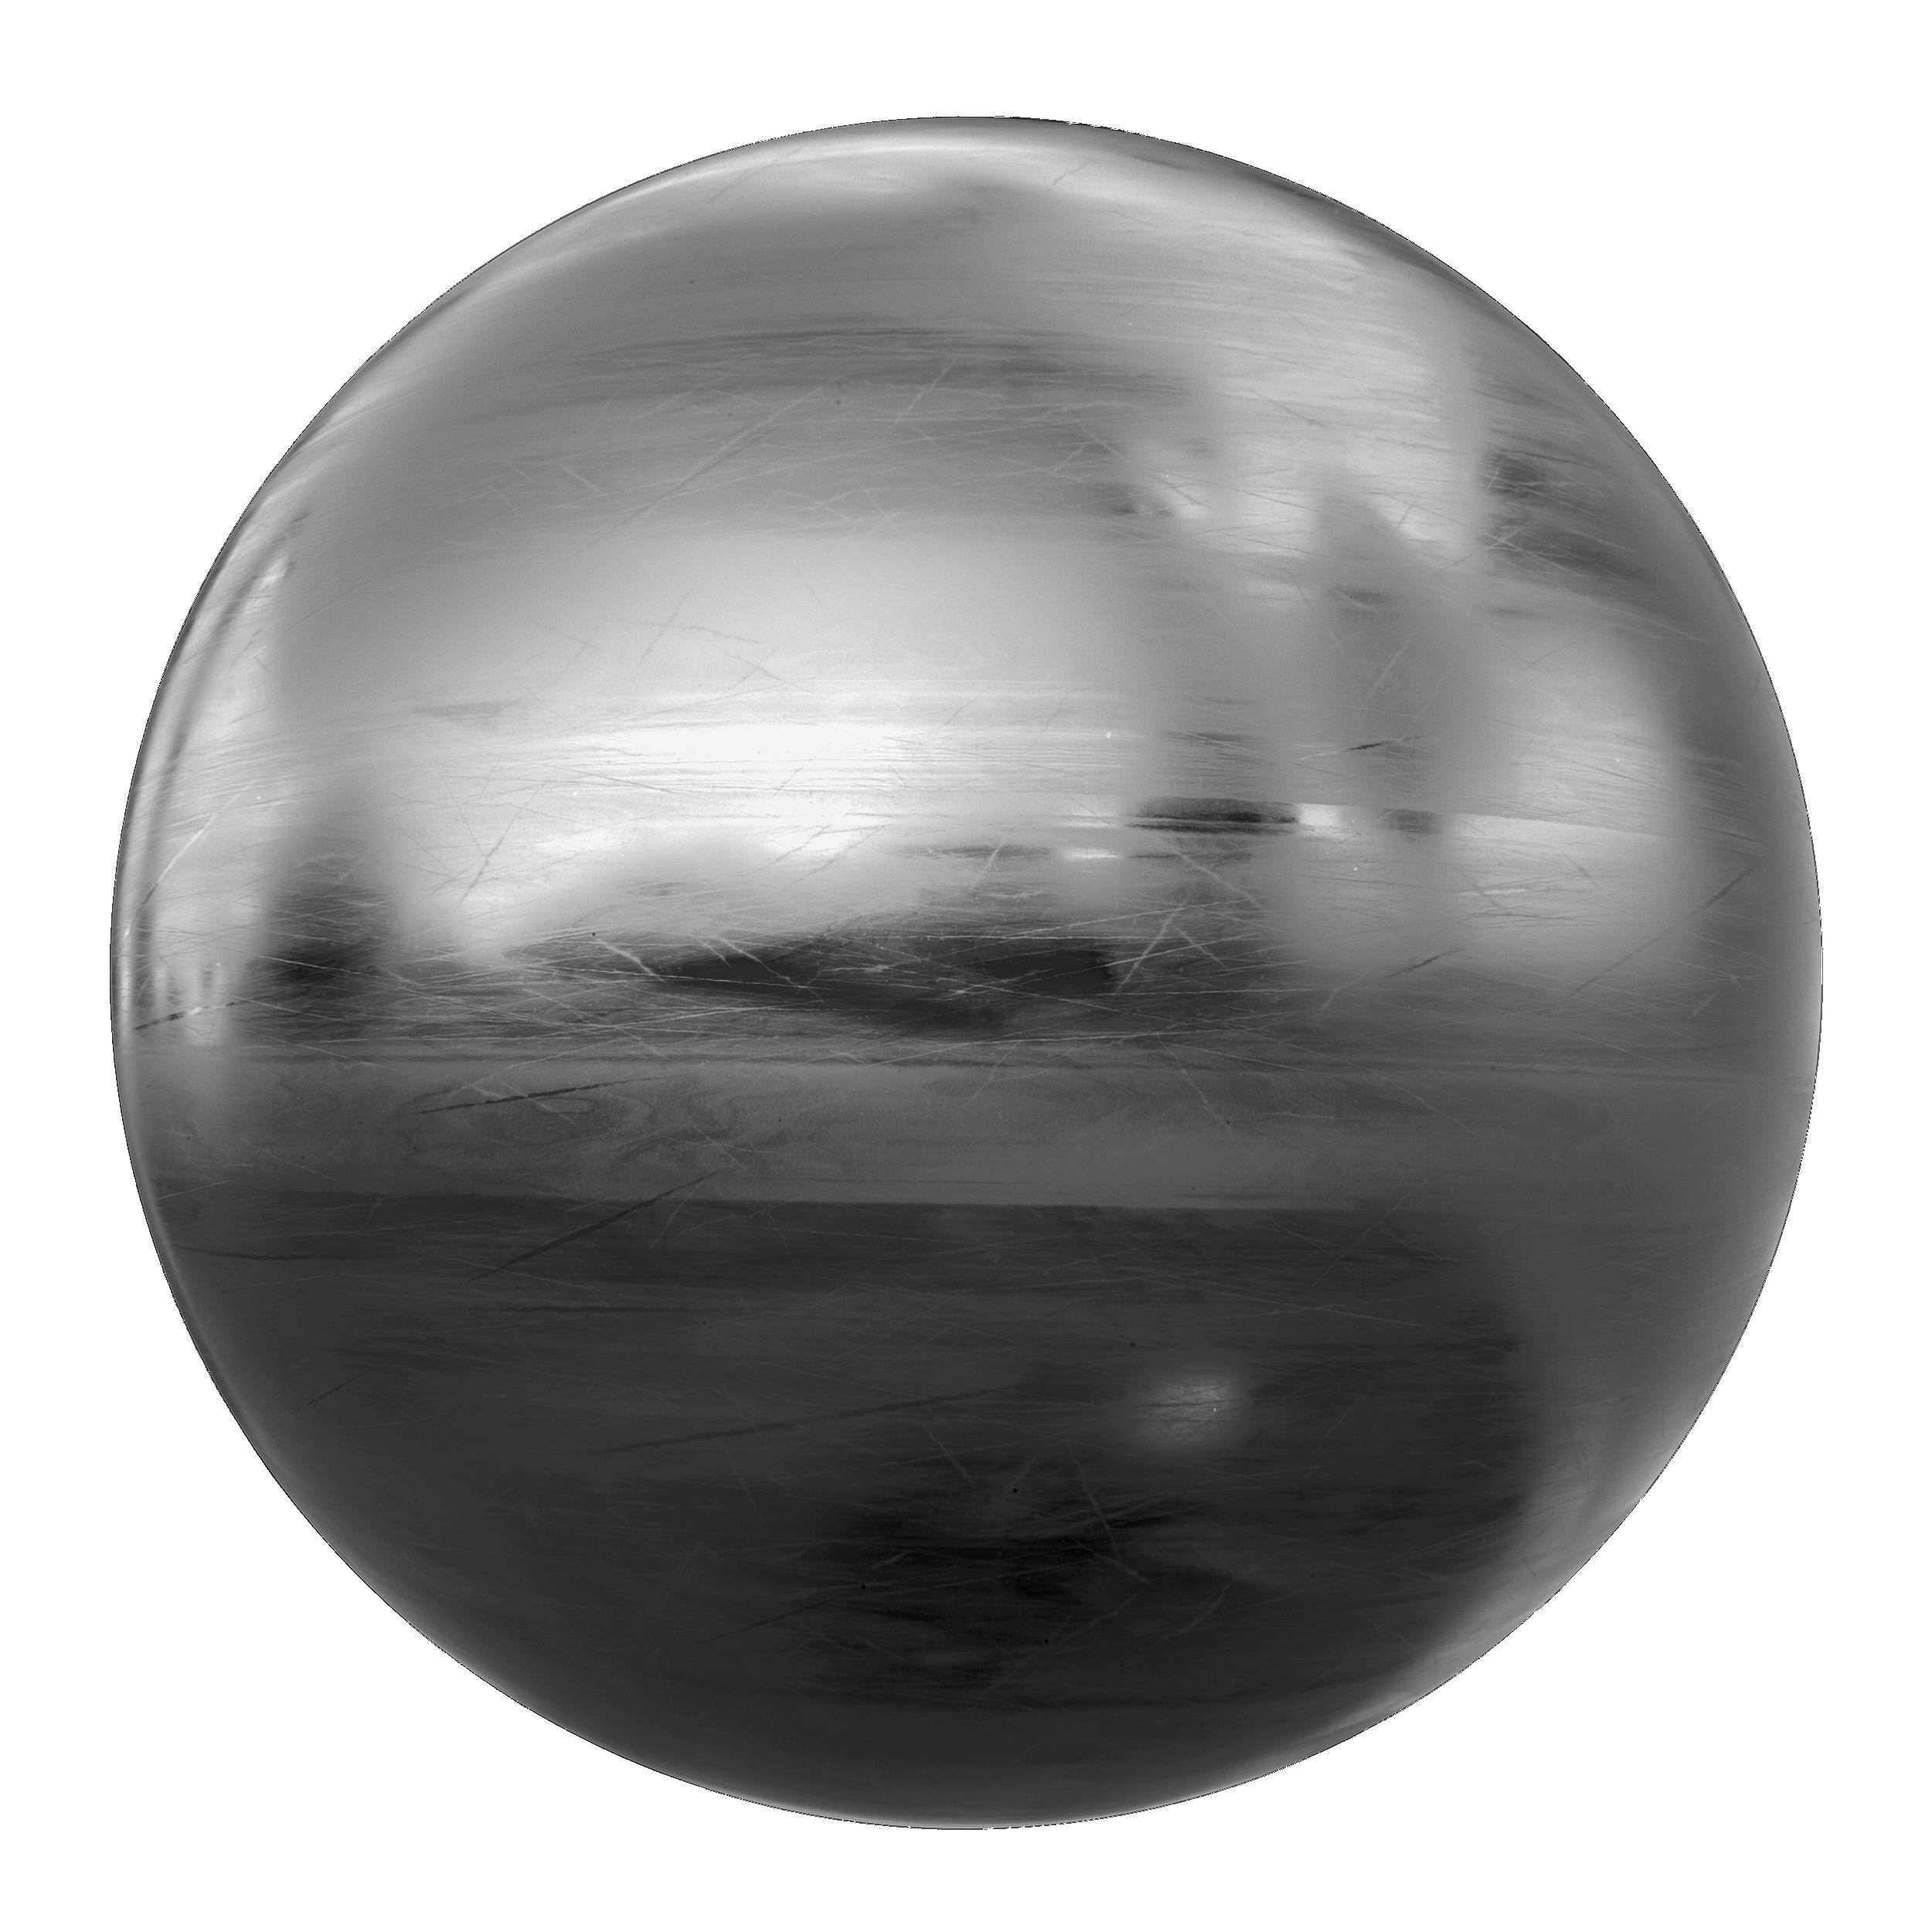 render_01 (2) copy.png